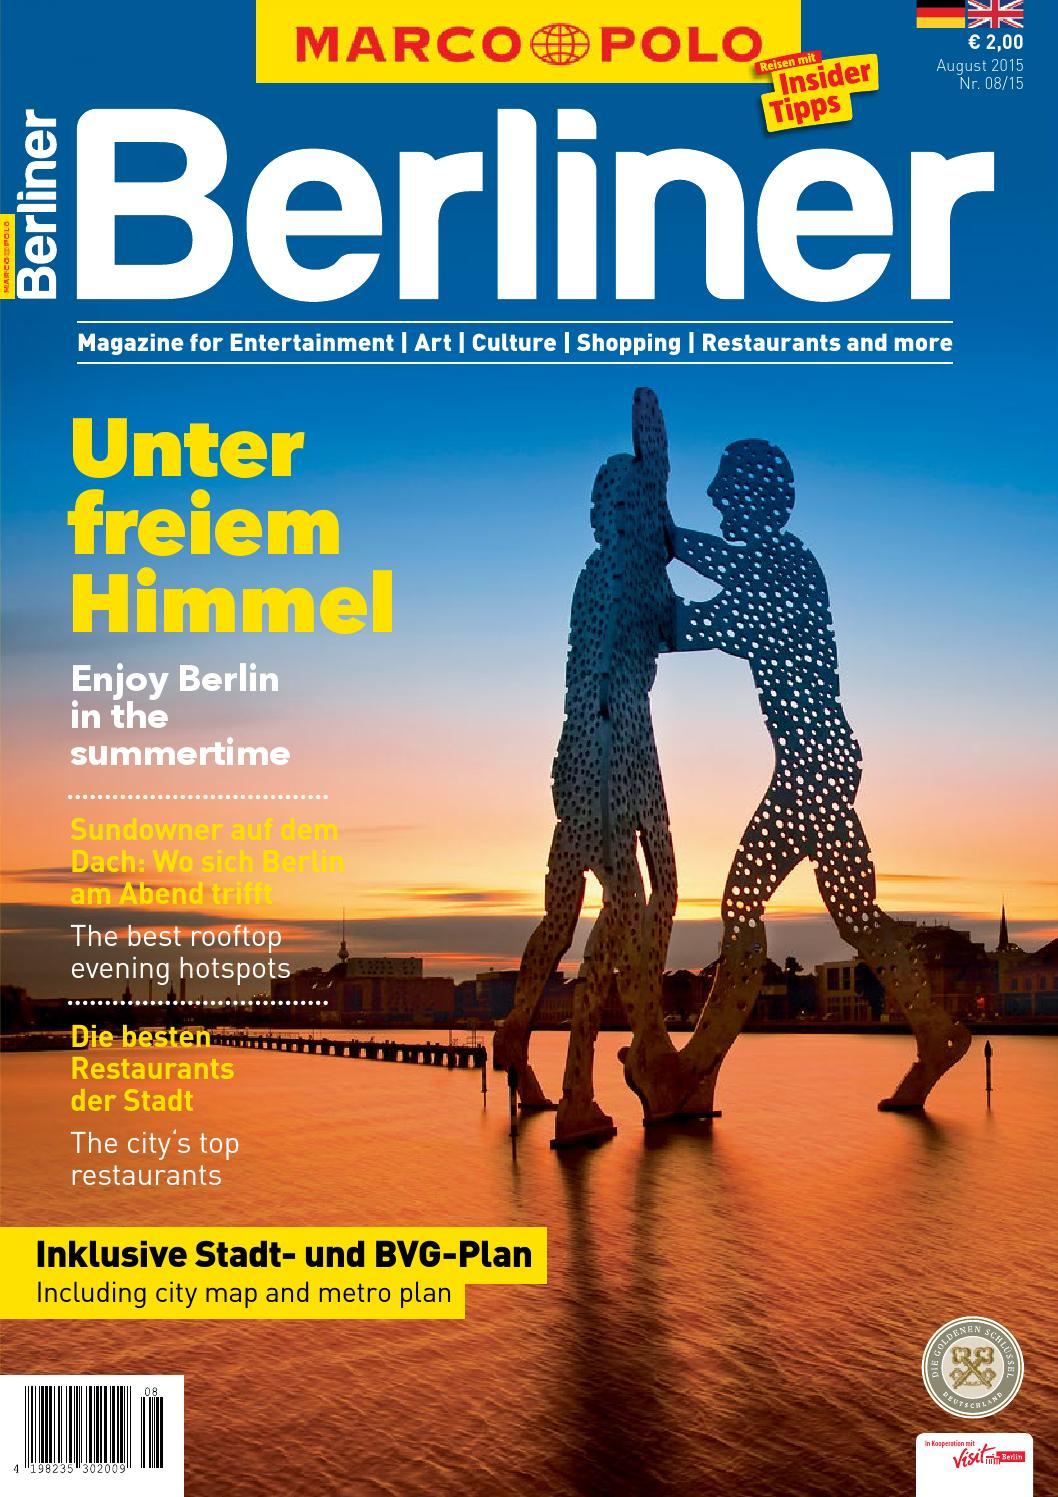 MARCO POLO Berliner 08/15 by Berlin Medien GmbH - issuu